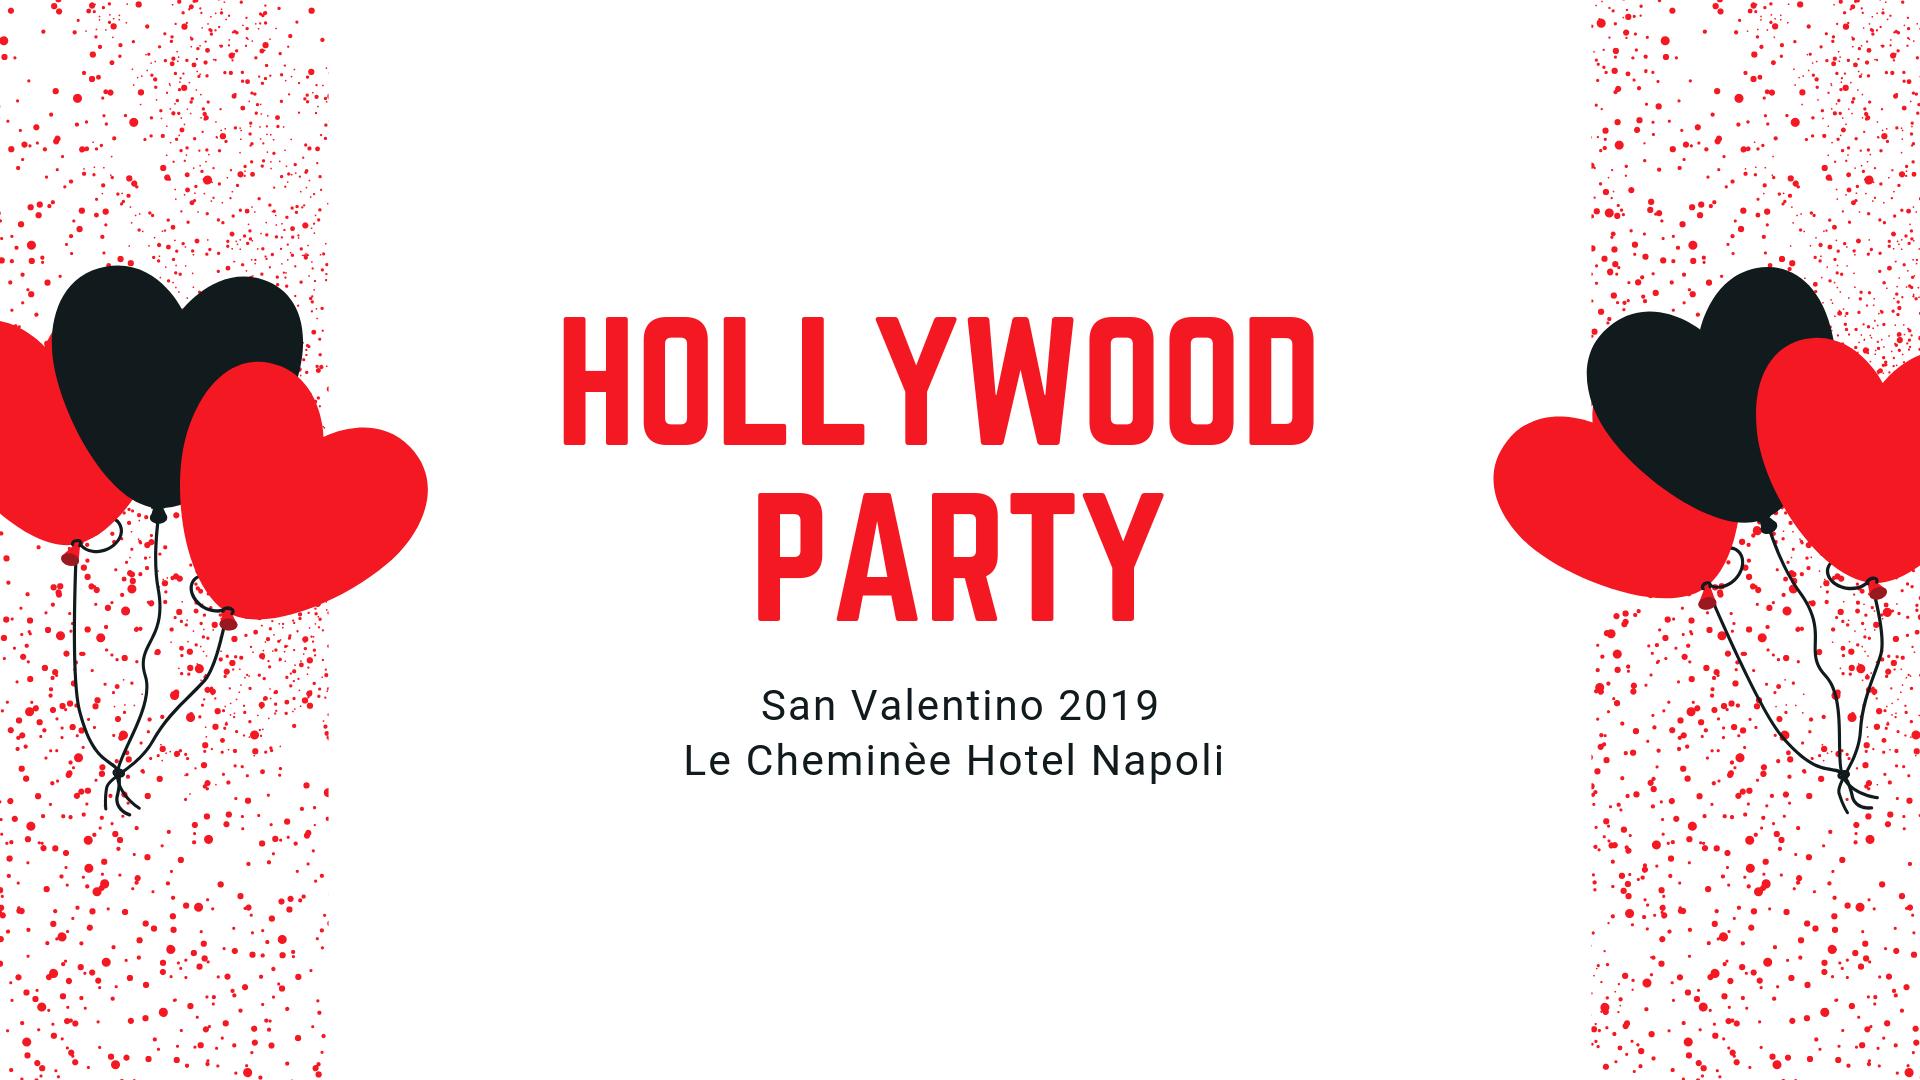 Cena San Valentino 2019 Napoli